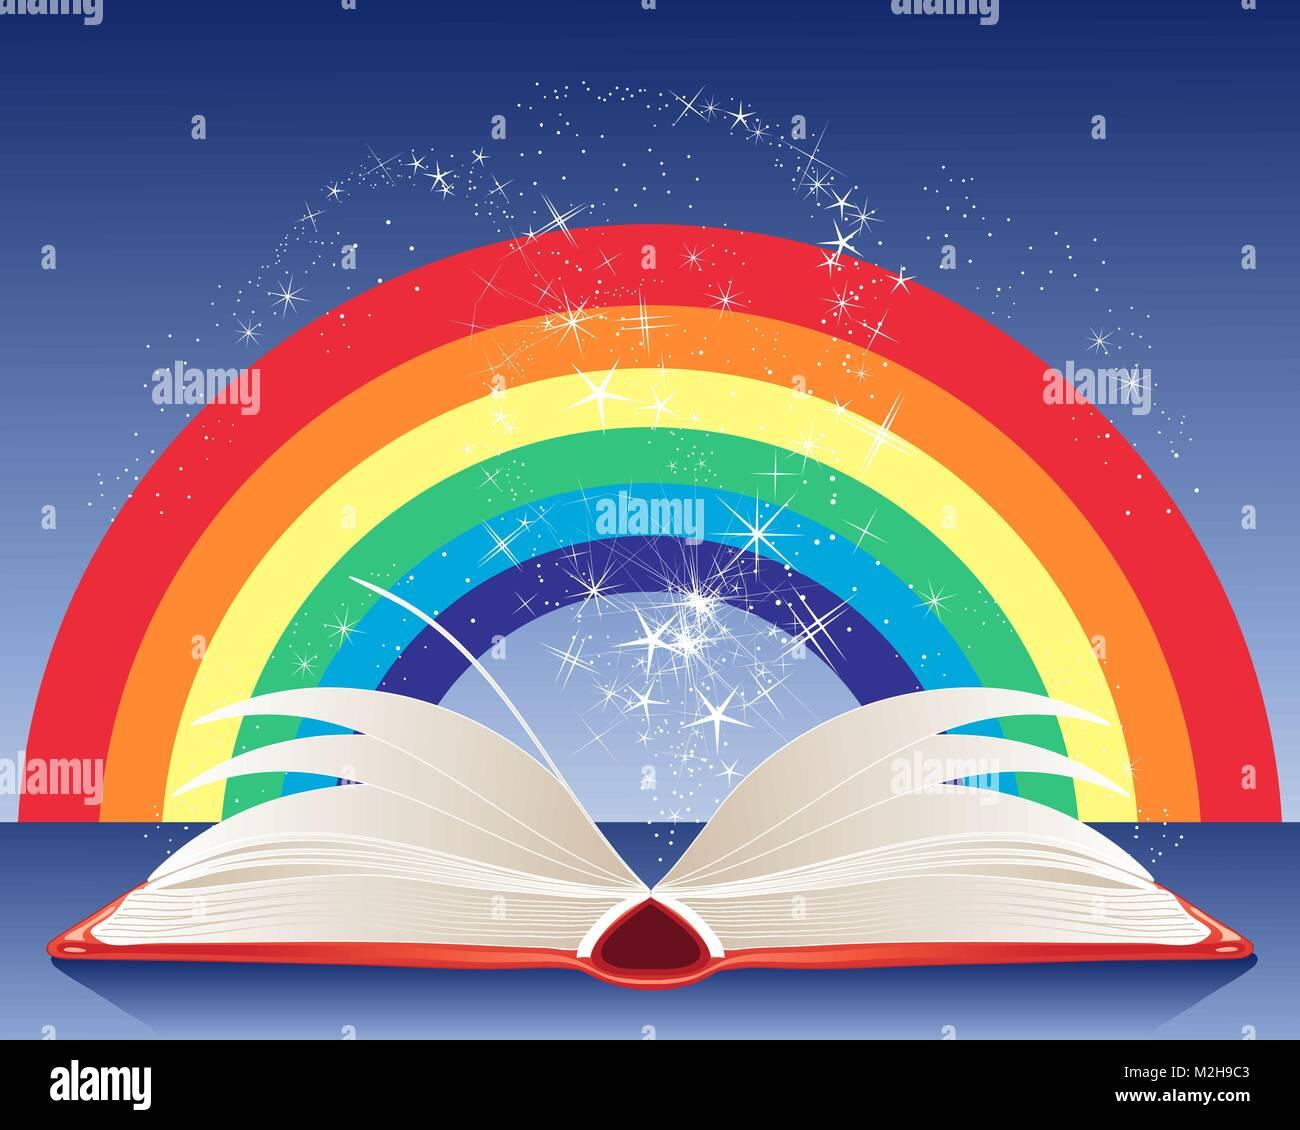 Картинки книга и цветы и радуга, еда